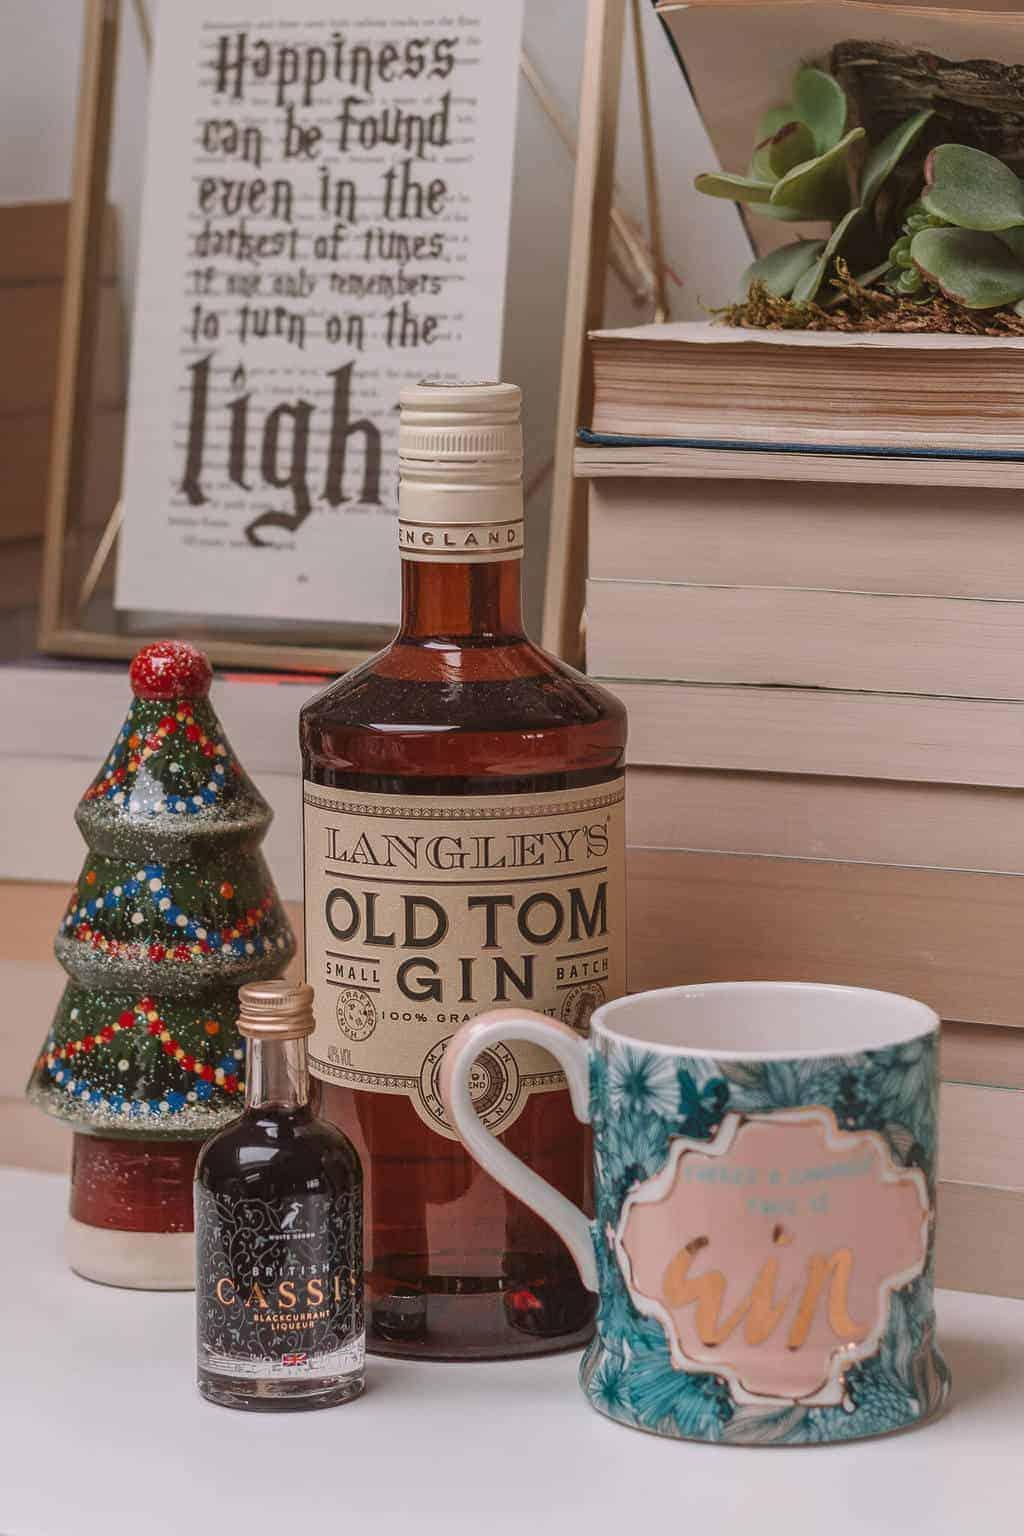 Gin - Christmas Gift Guide 2018: Brilliant Christmas Gift Ideas For Her #whatshotblog